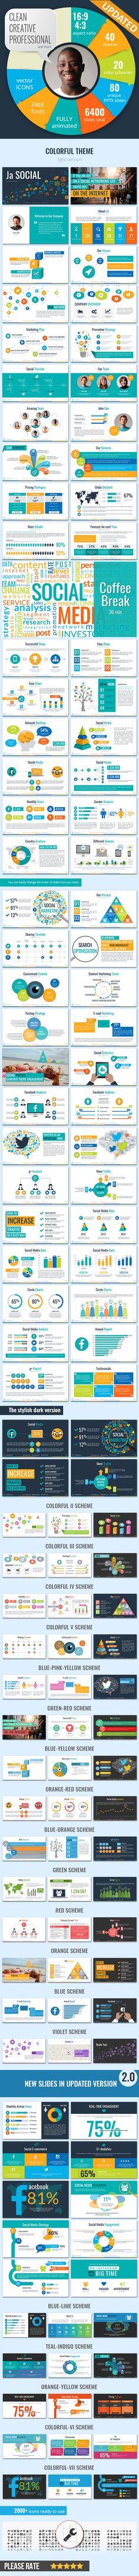 Social Media Ja PowerPoint Presentation Template — Powerpoint PPTX #creative #Social Marketing • Available here → https://graphicriver.net/item/social-media-ja-powerpoint-presentation-template/9274859?ref=pxcr